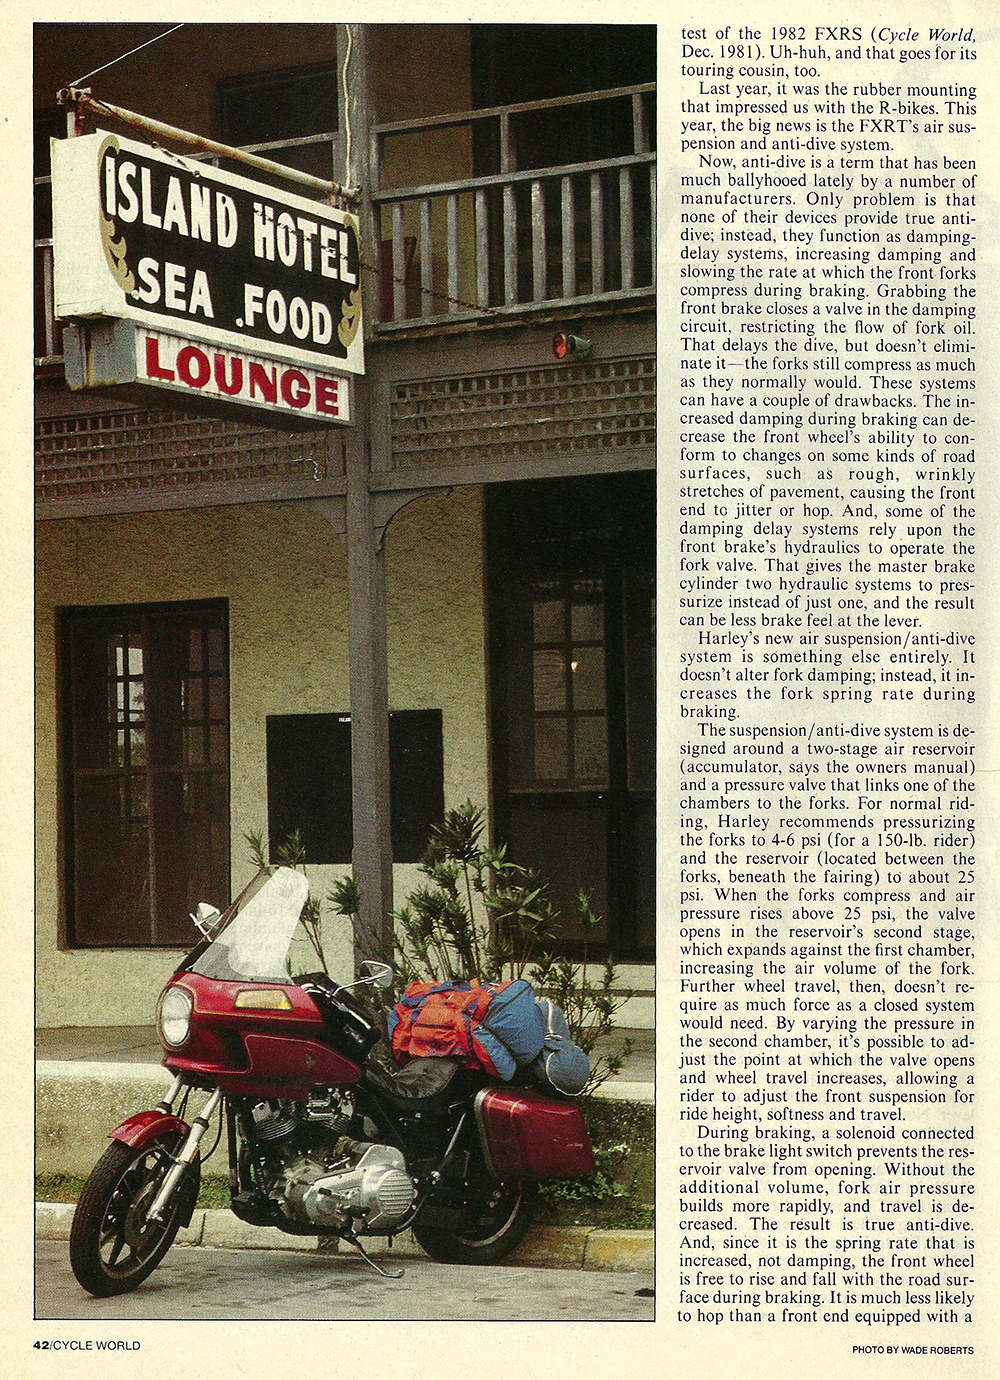 1983 Harley-Davidson FXRT road test 03.jpg